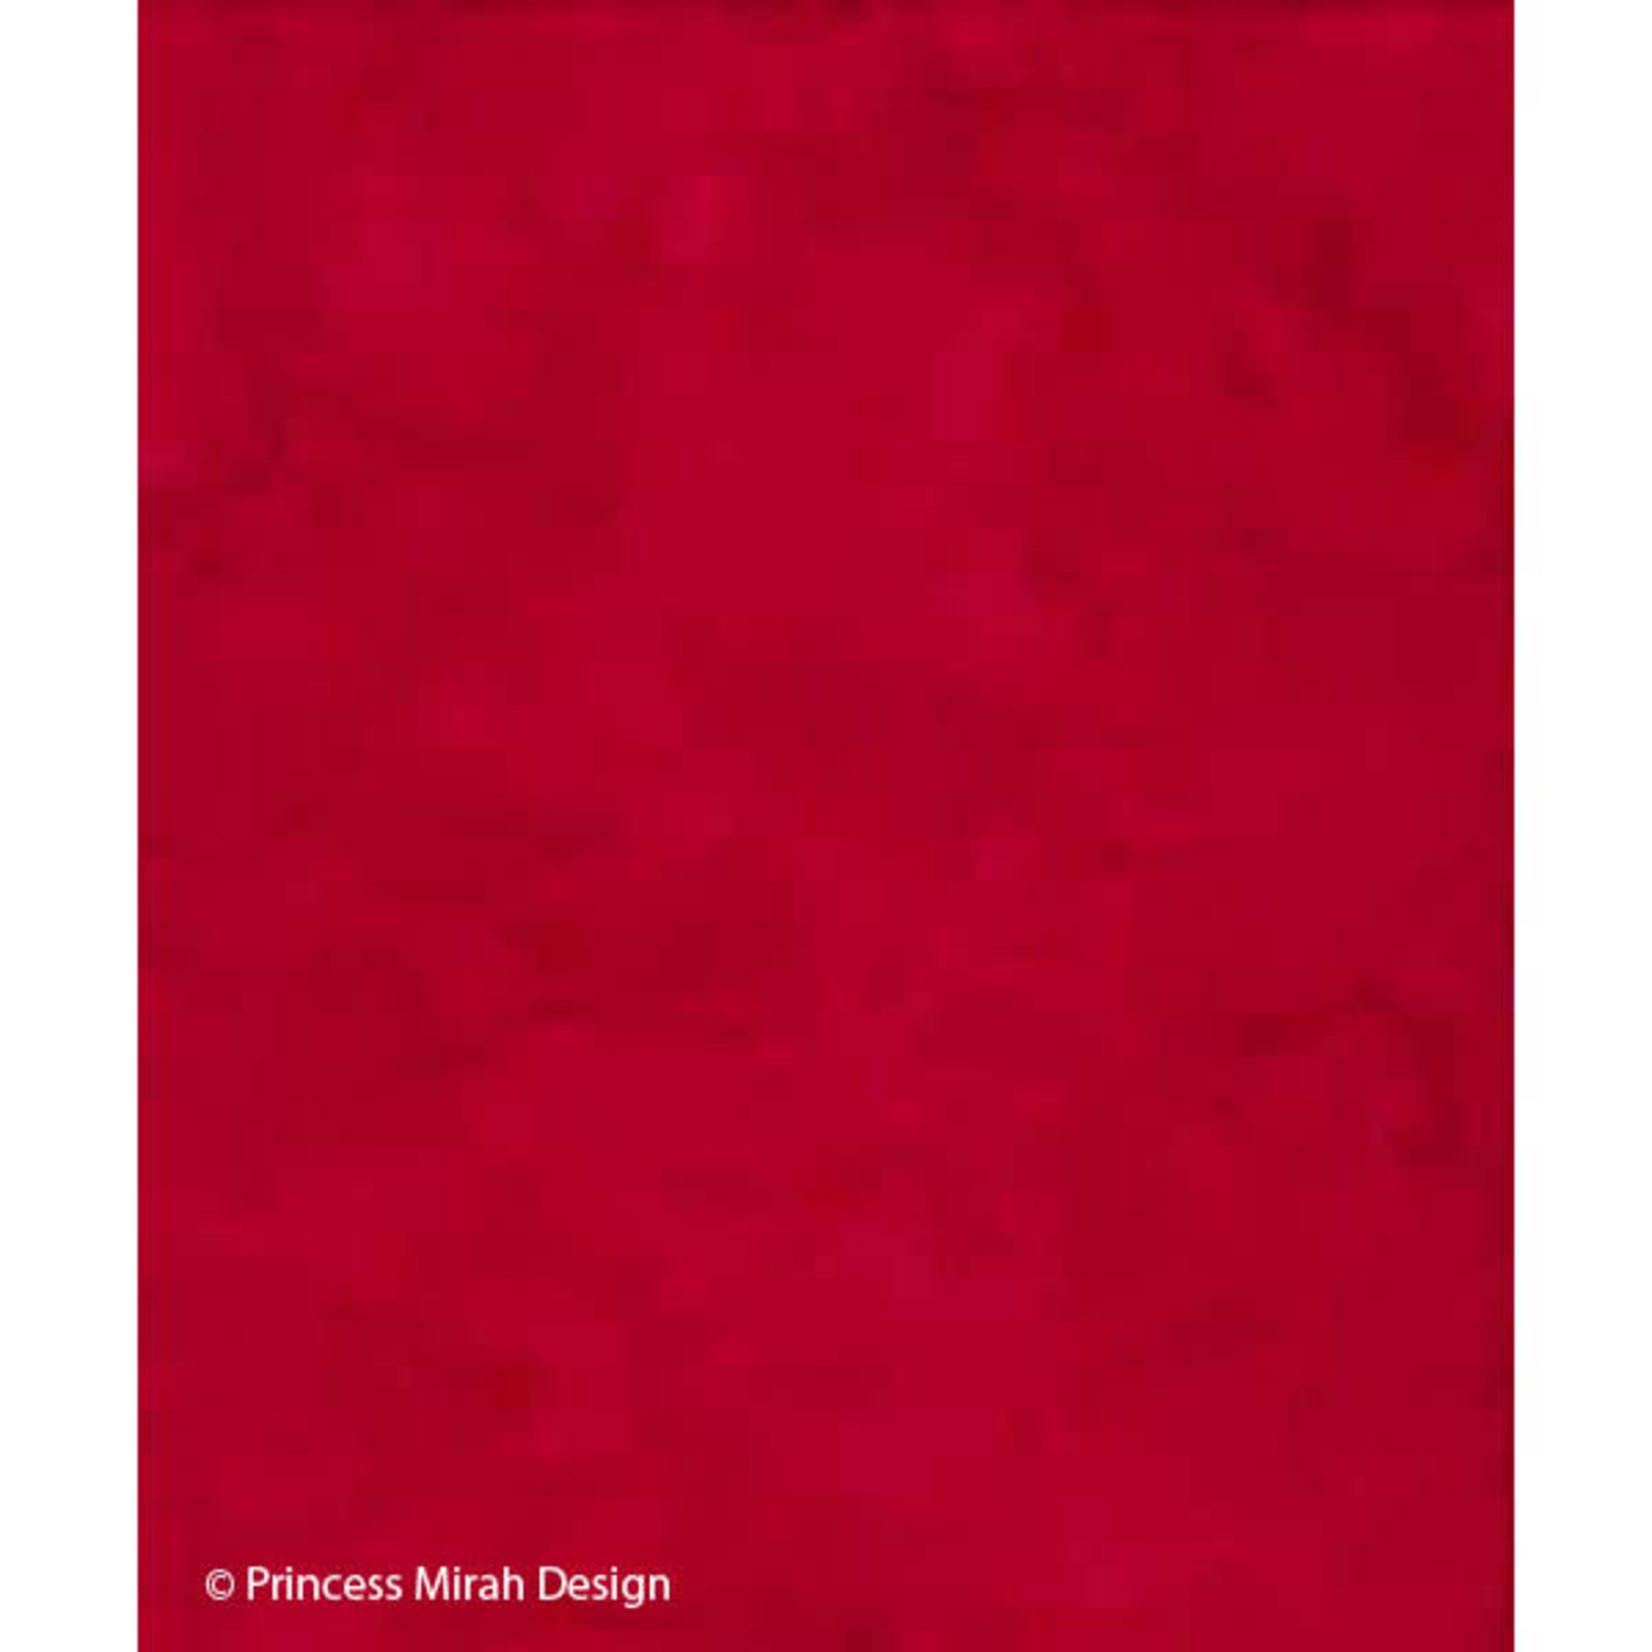 Mirah Zriya Princess Palette, Ribbon Red, UB-10-85 $0.19 per cm or $19/m